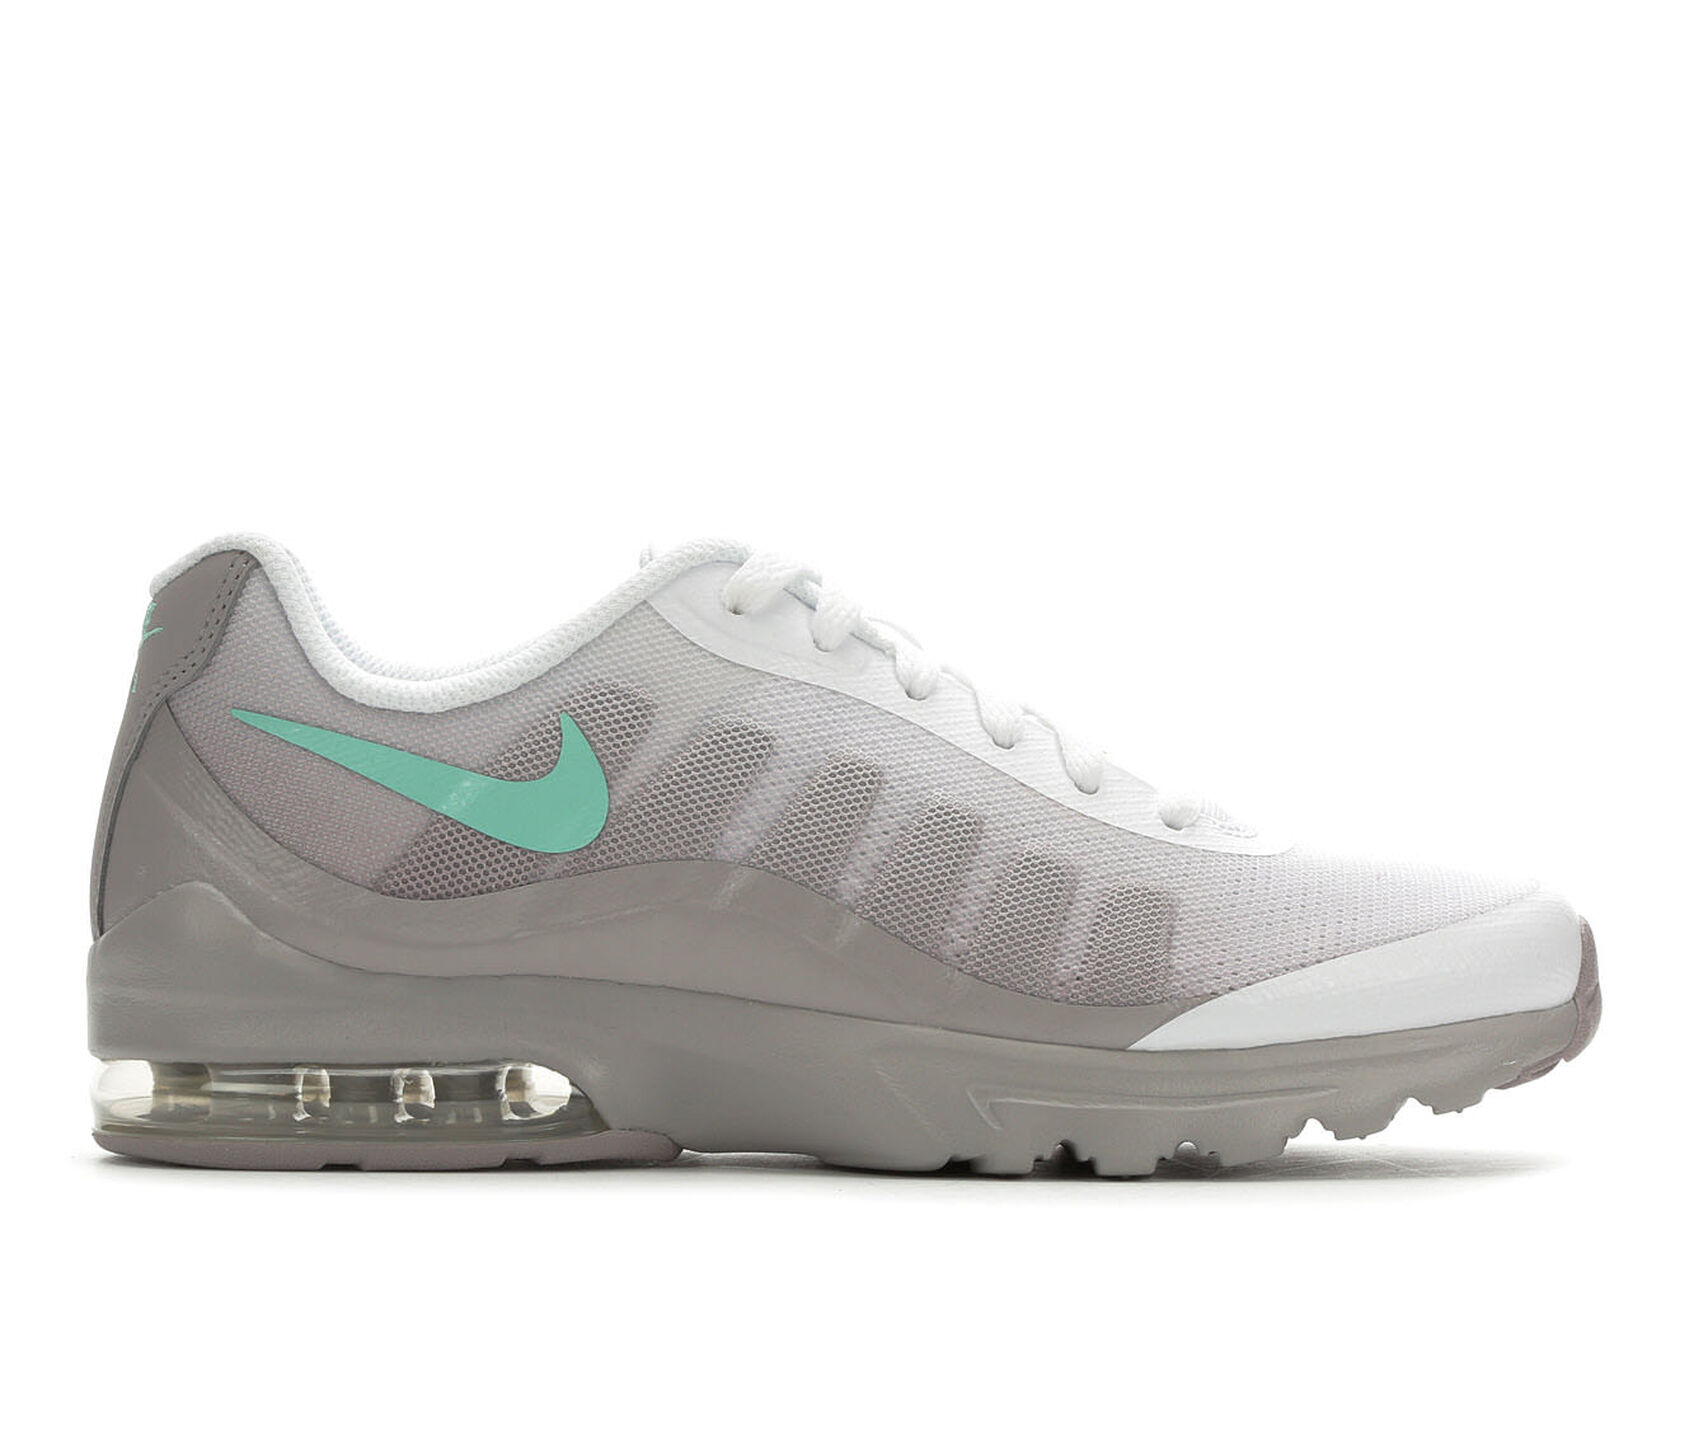 san francisco 68b53 389c5 ... Nike Air Max Invigor Print Athletic Sneakers. Previous